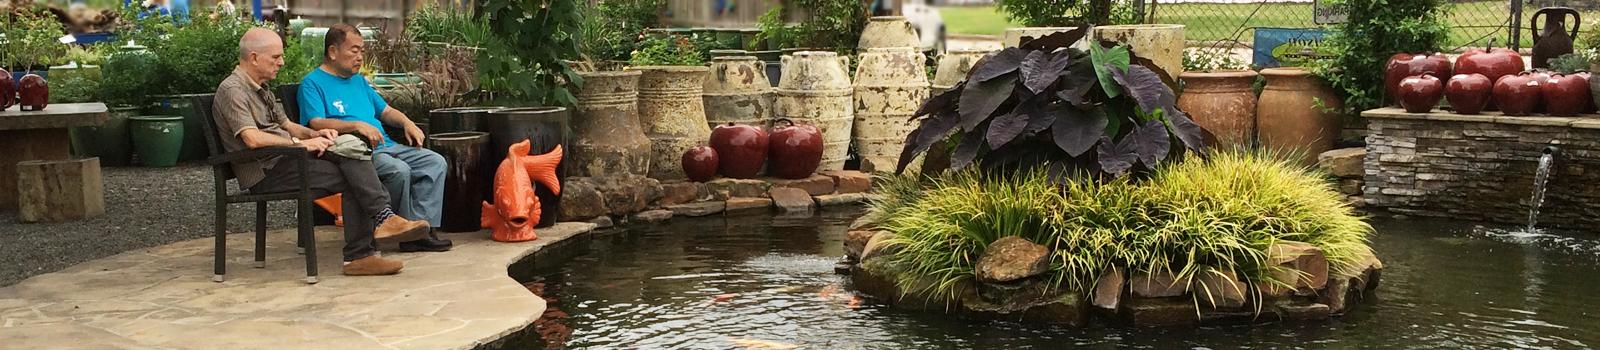 We Make Water Gardening Fun & Relaxing